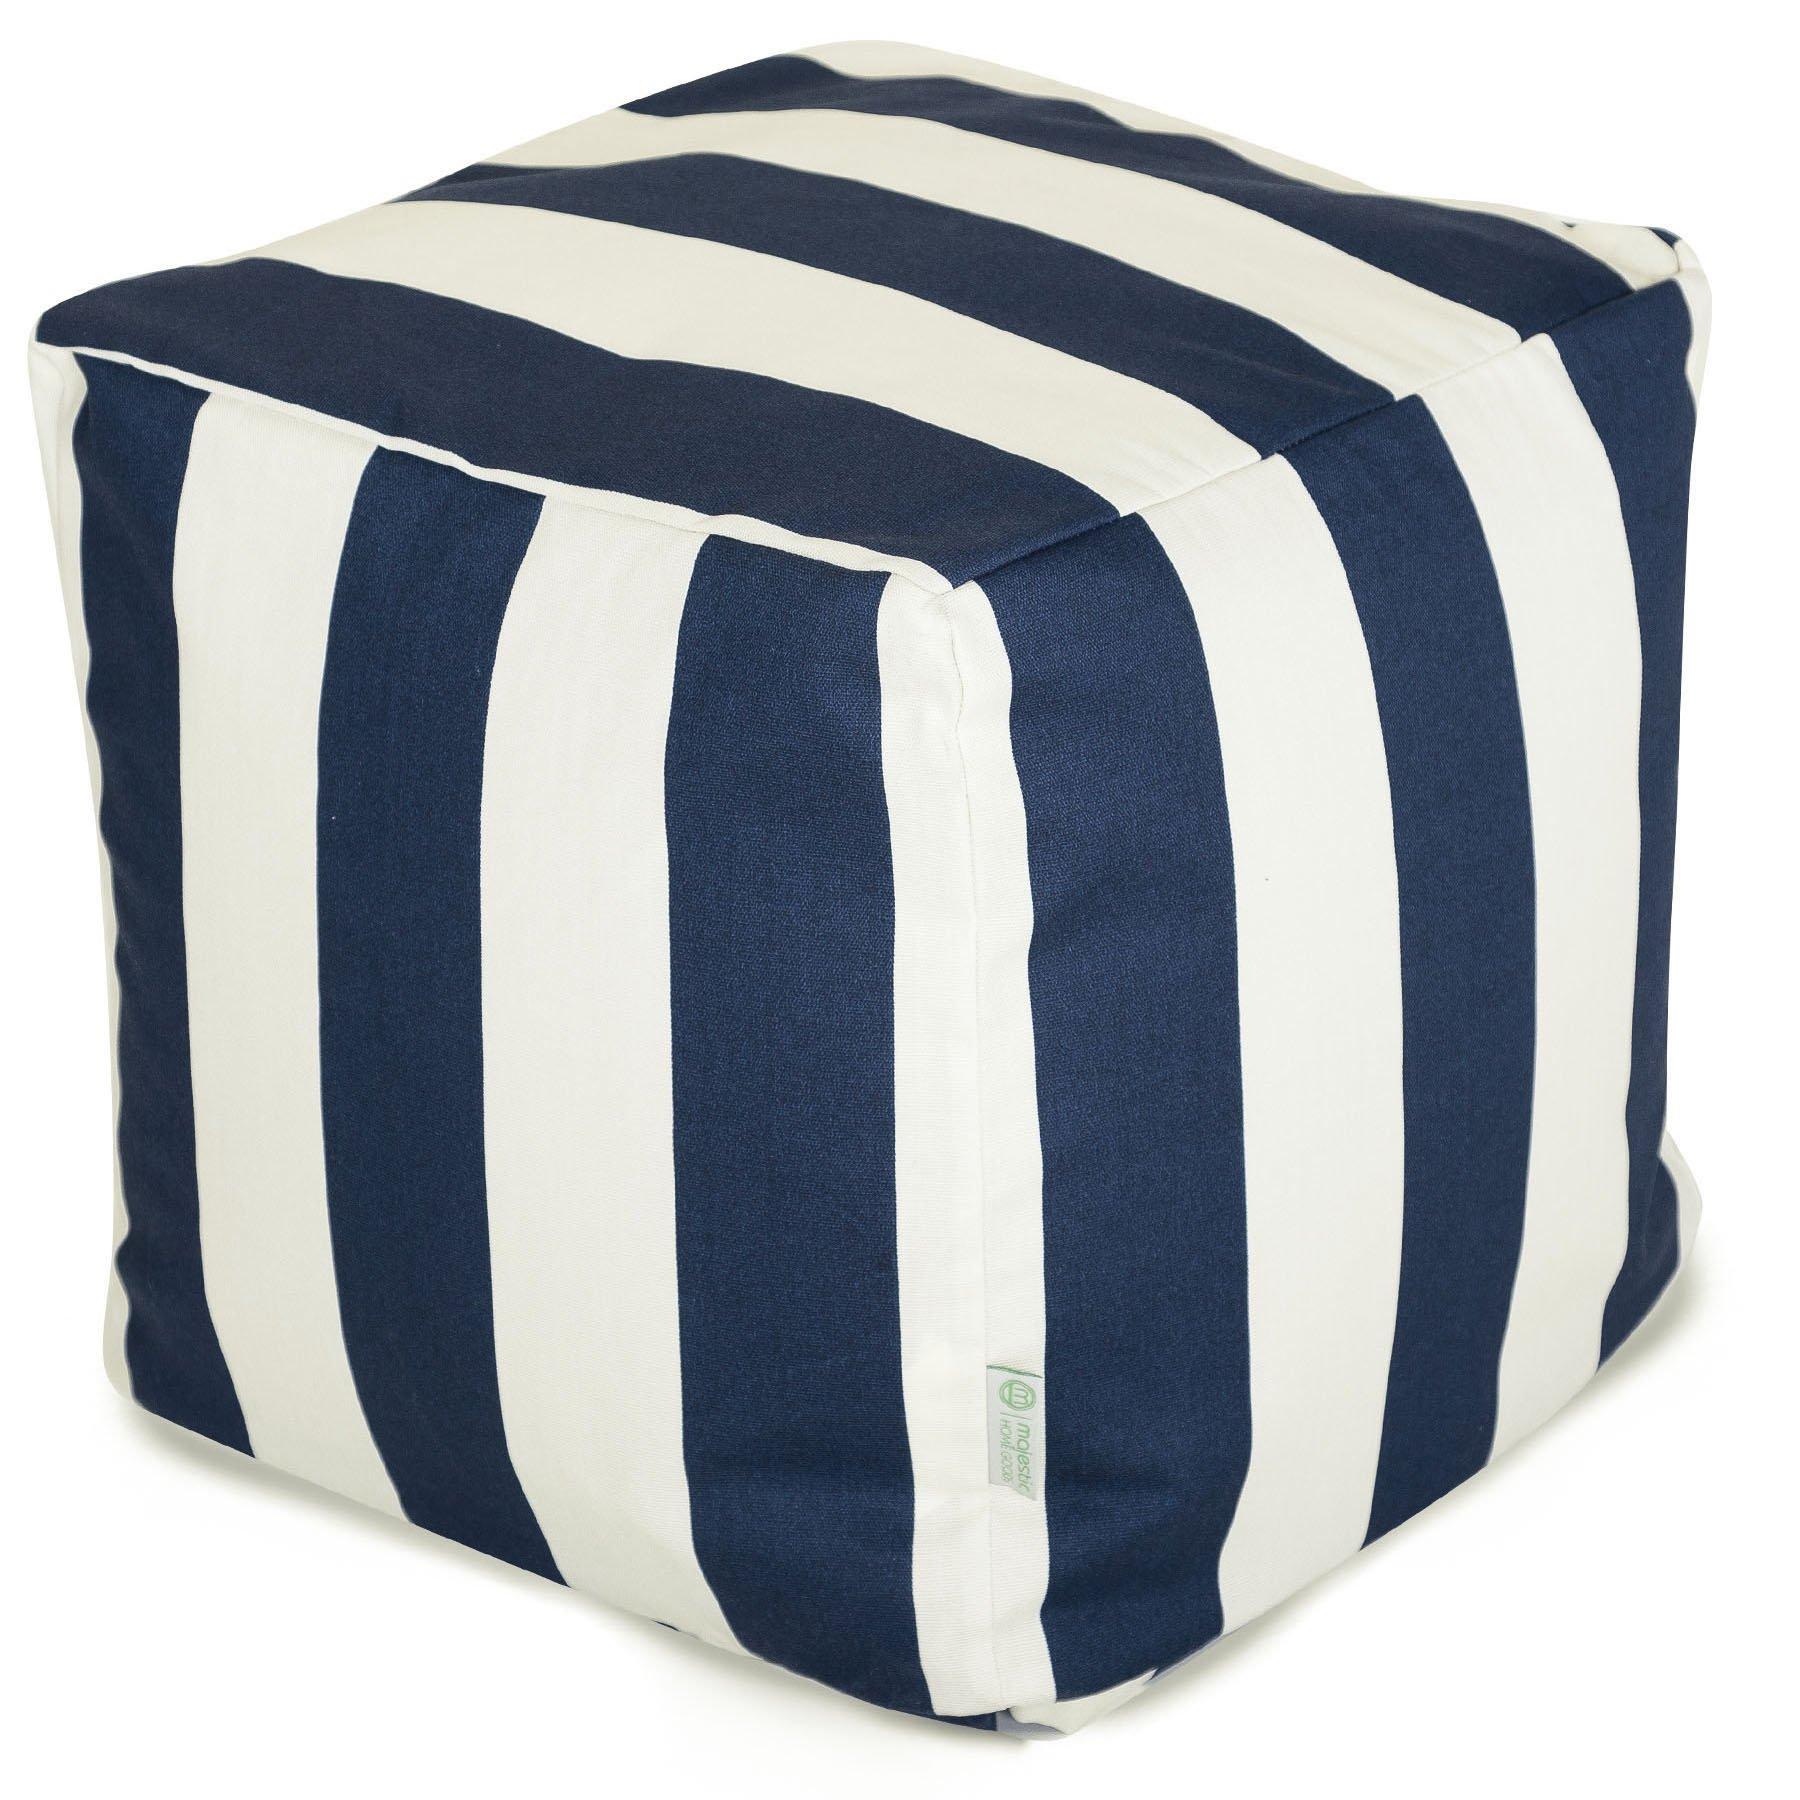 Majestic Home Goods Navy Blue Vertical Stripe Indoor/Outdoor Bean Bag Ottoman Pouf Cube 17'' L x 17'' W x 17'' H